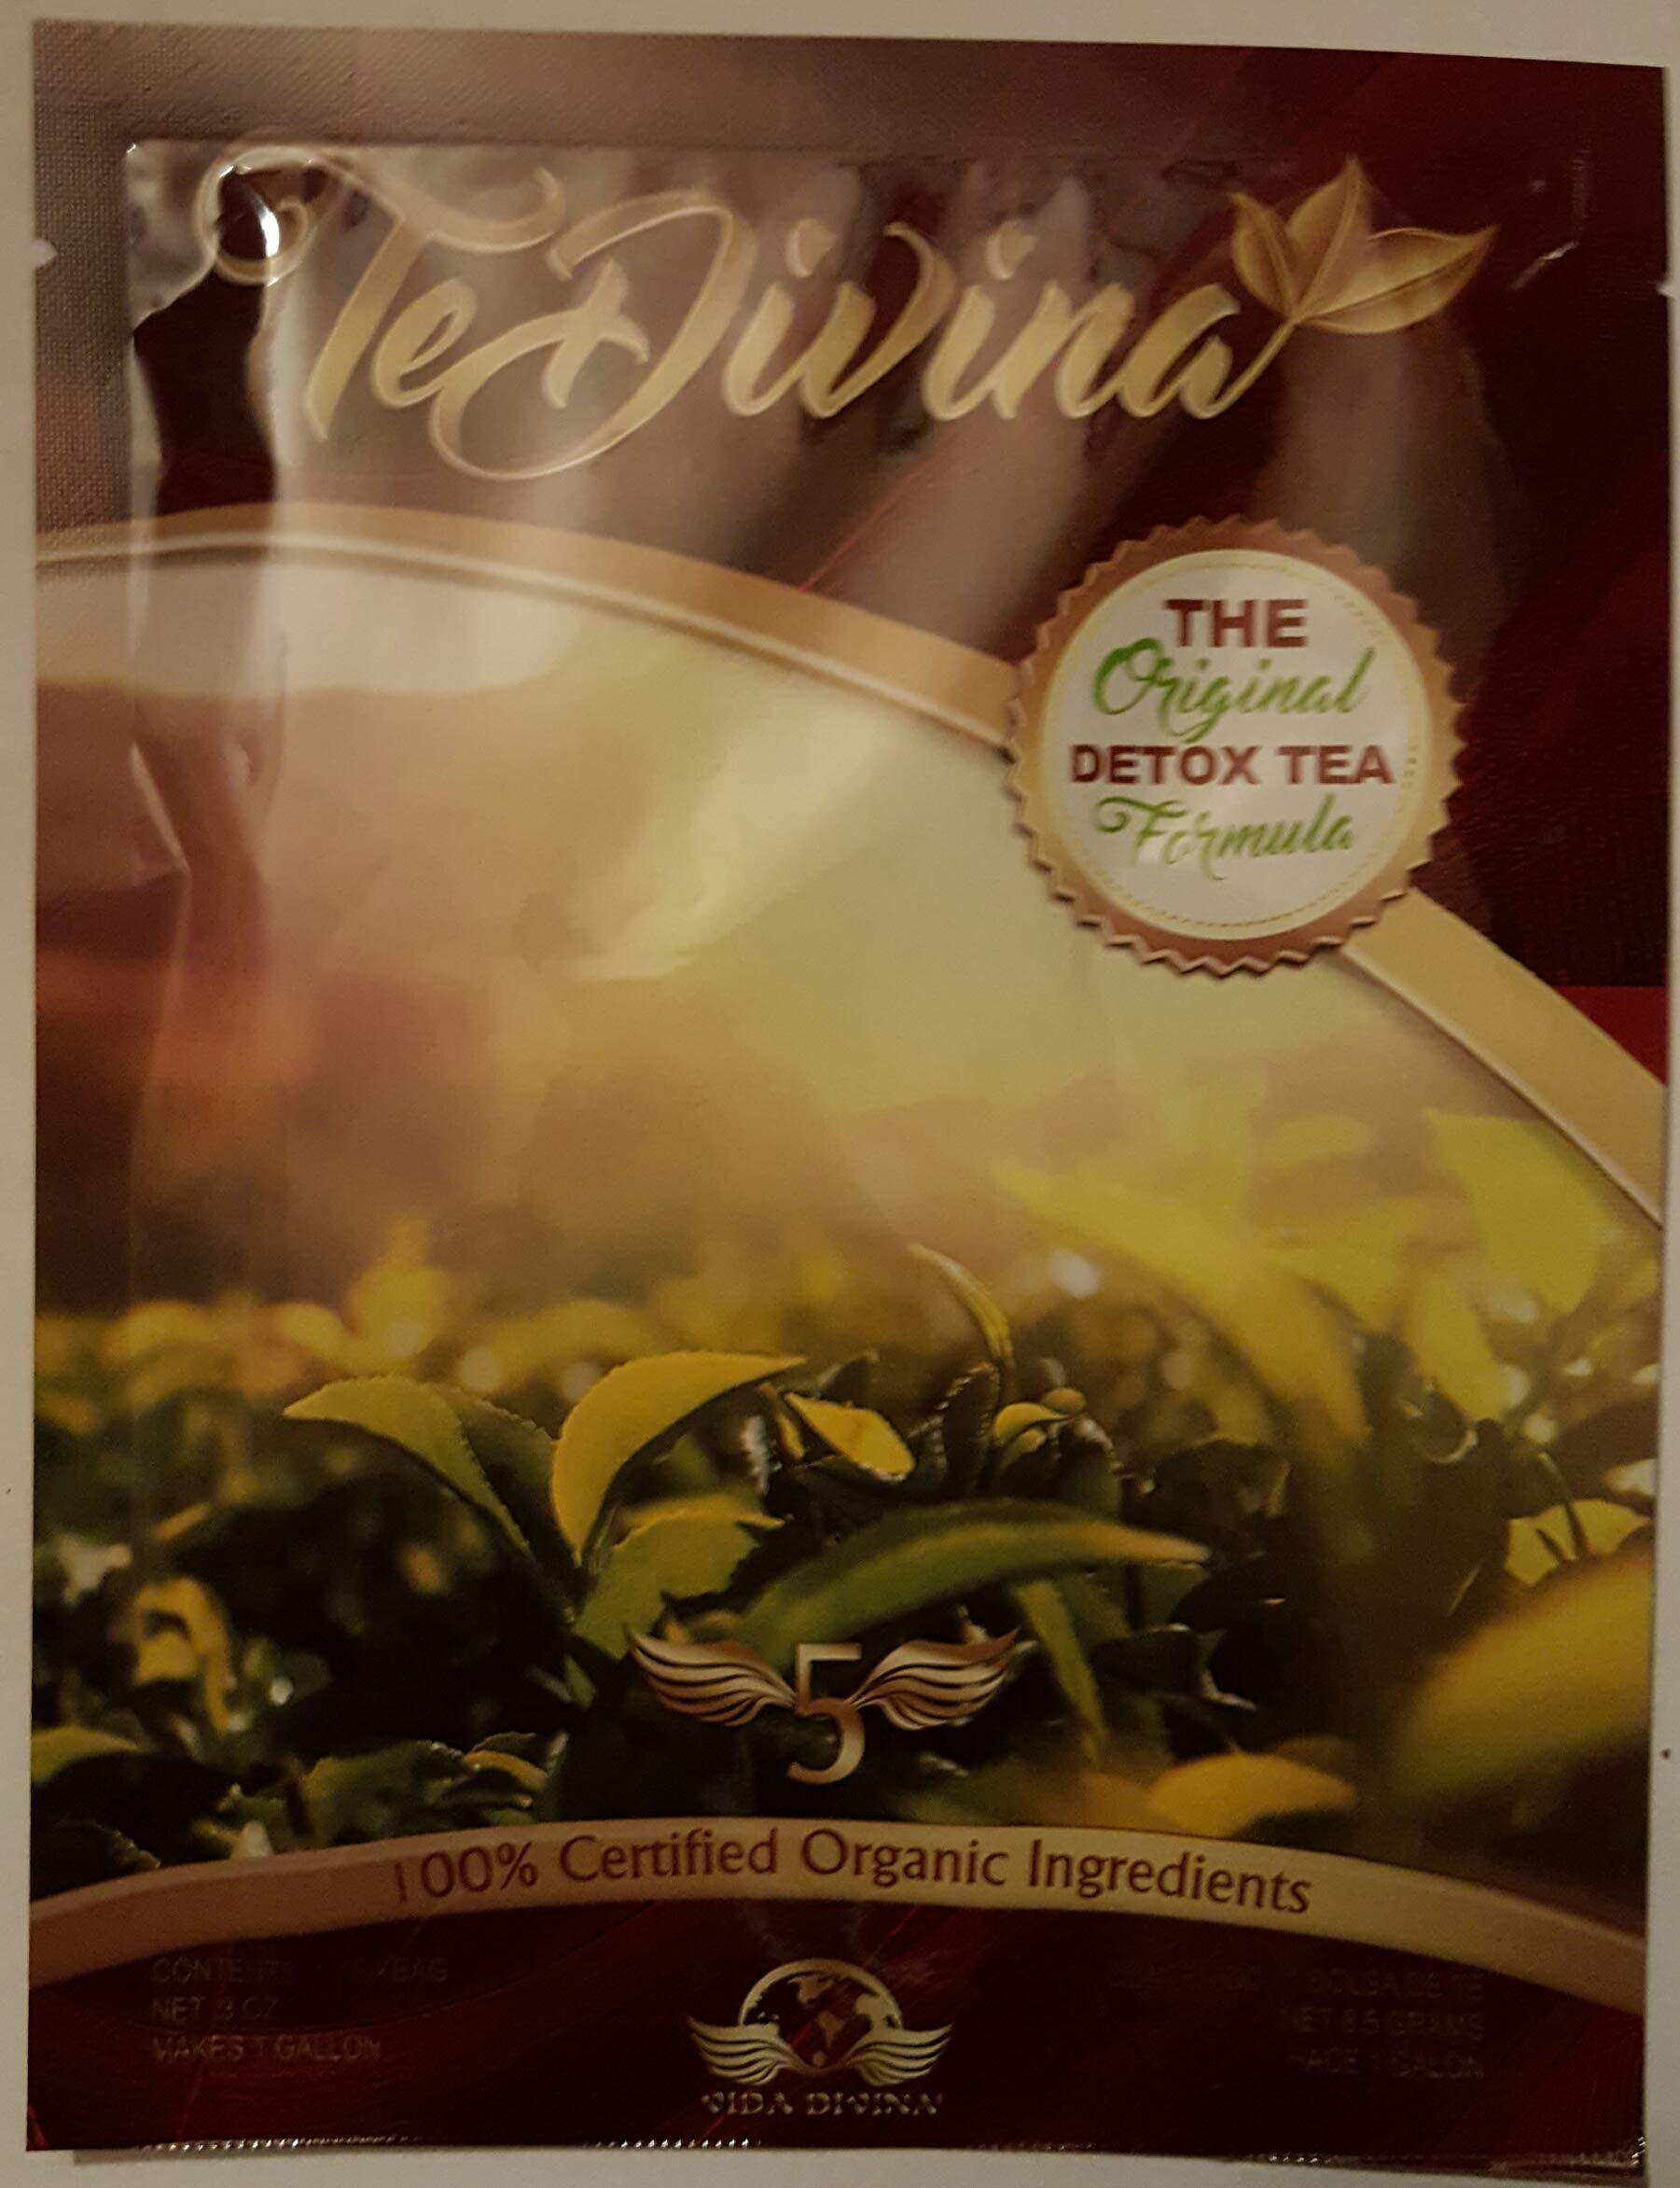 Best Seller Authentic,In stock,TeDivina 6 weeks supply supply,coming back of the''ORIGINAL''detox tea, way more effective than iaso tea by Vida Divina Te Divina